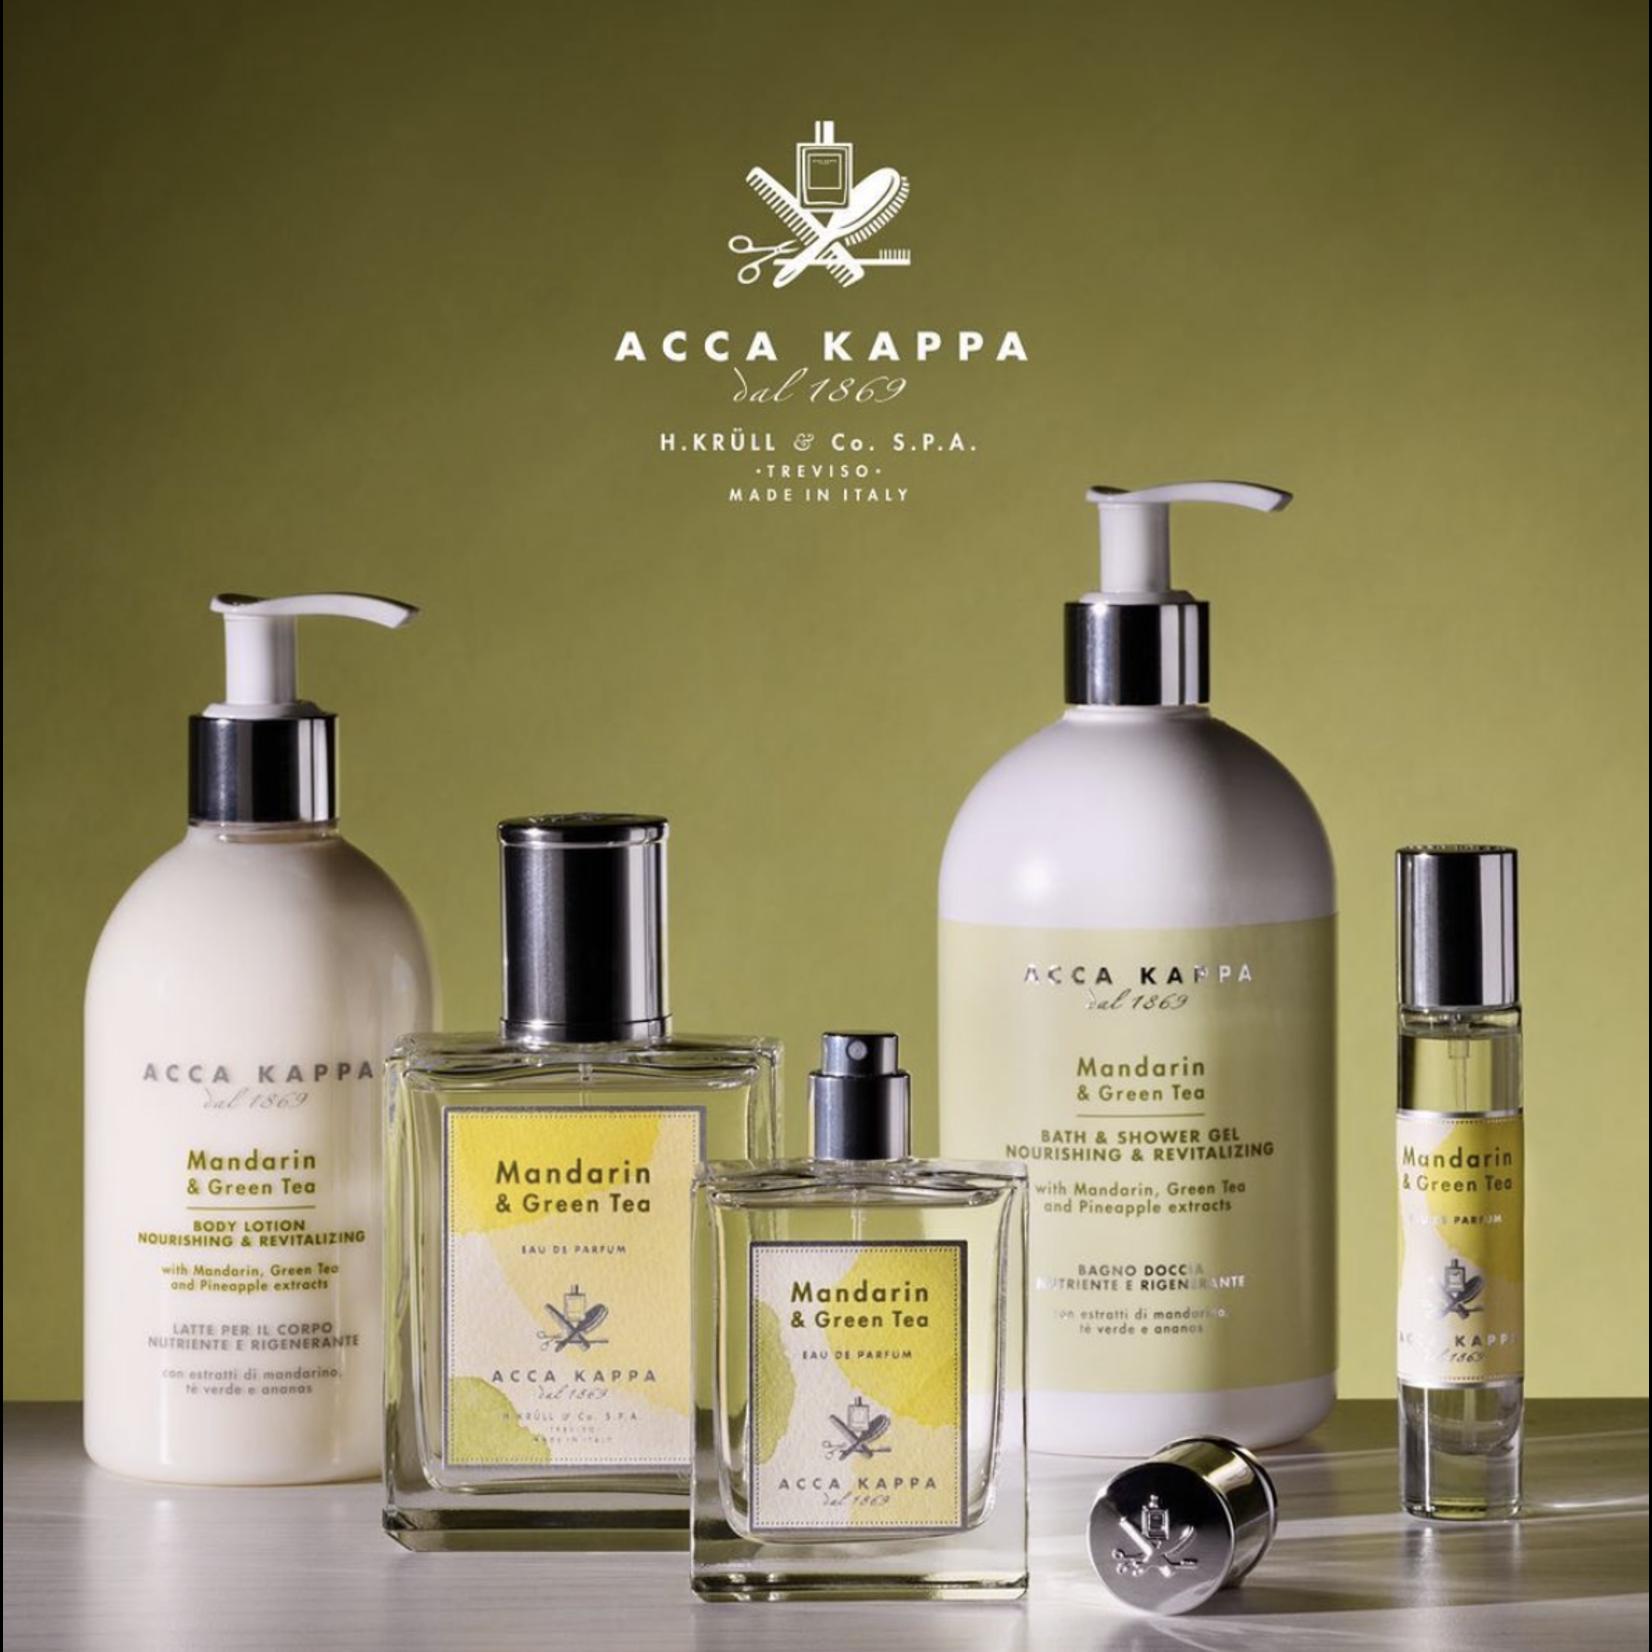 ACCA KAPPA ACCA KAPPA · MANDARIN & GREEN TEA BATH & SHOWER GEL 500ML